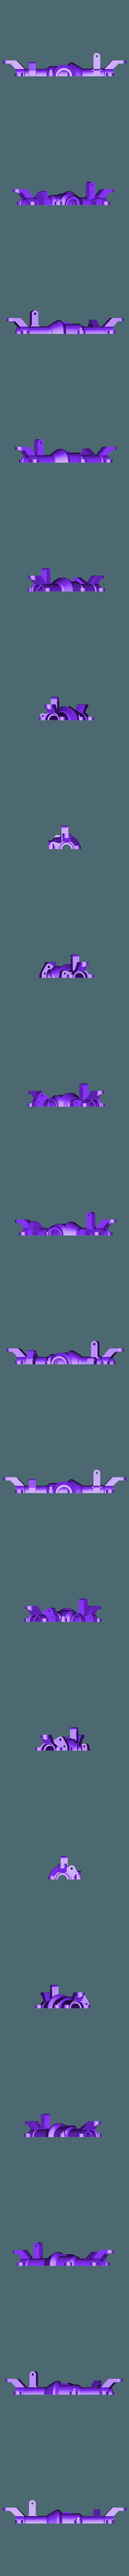 Truck_V4_Axle_Front_Single_Top.STL Download STL file 3D Printed Rc Truck V4 • 3D printable template, MrCrankyface